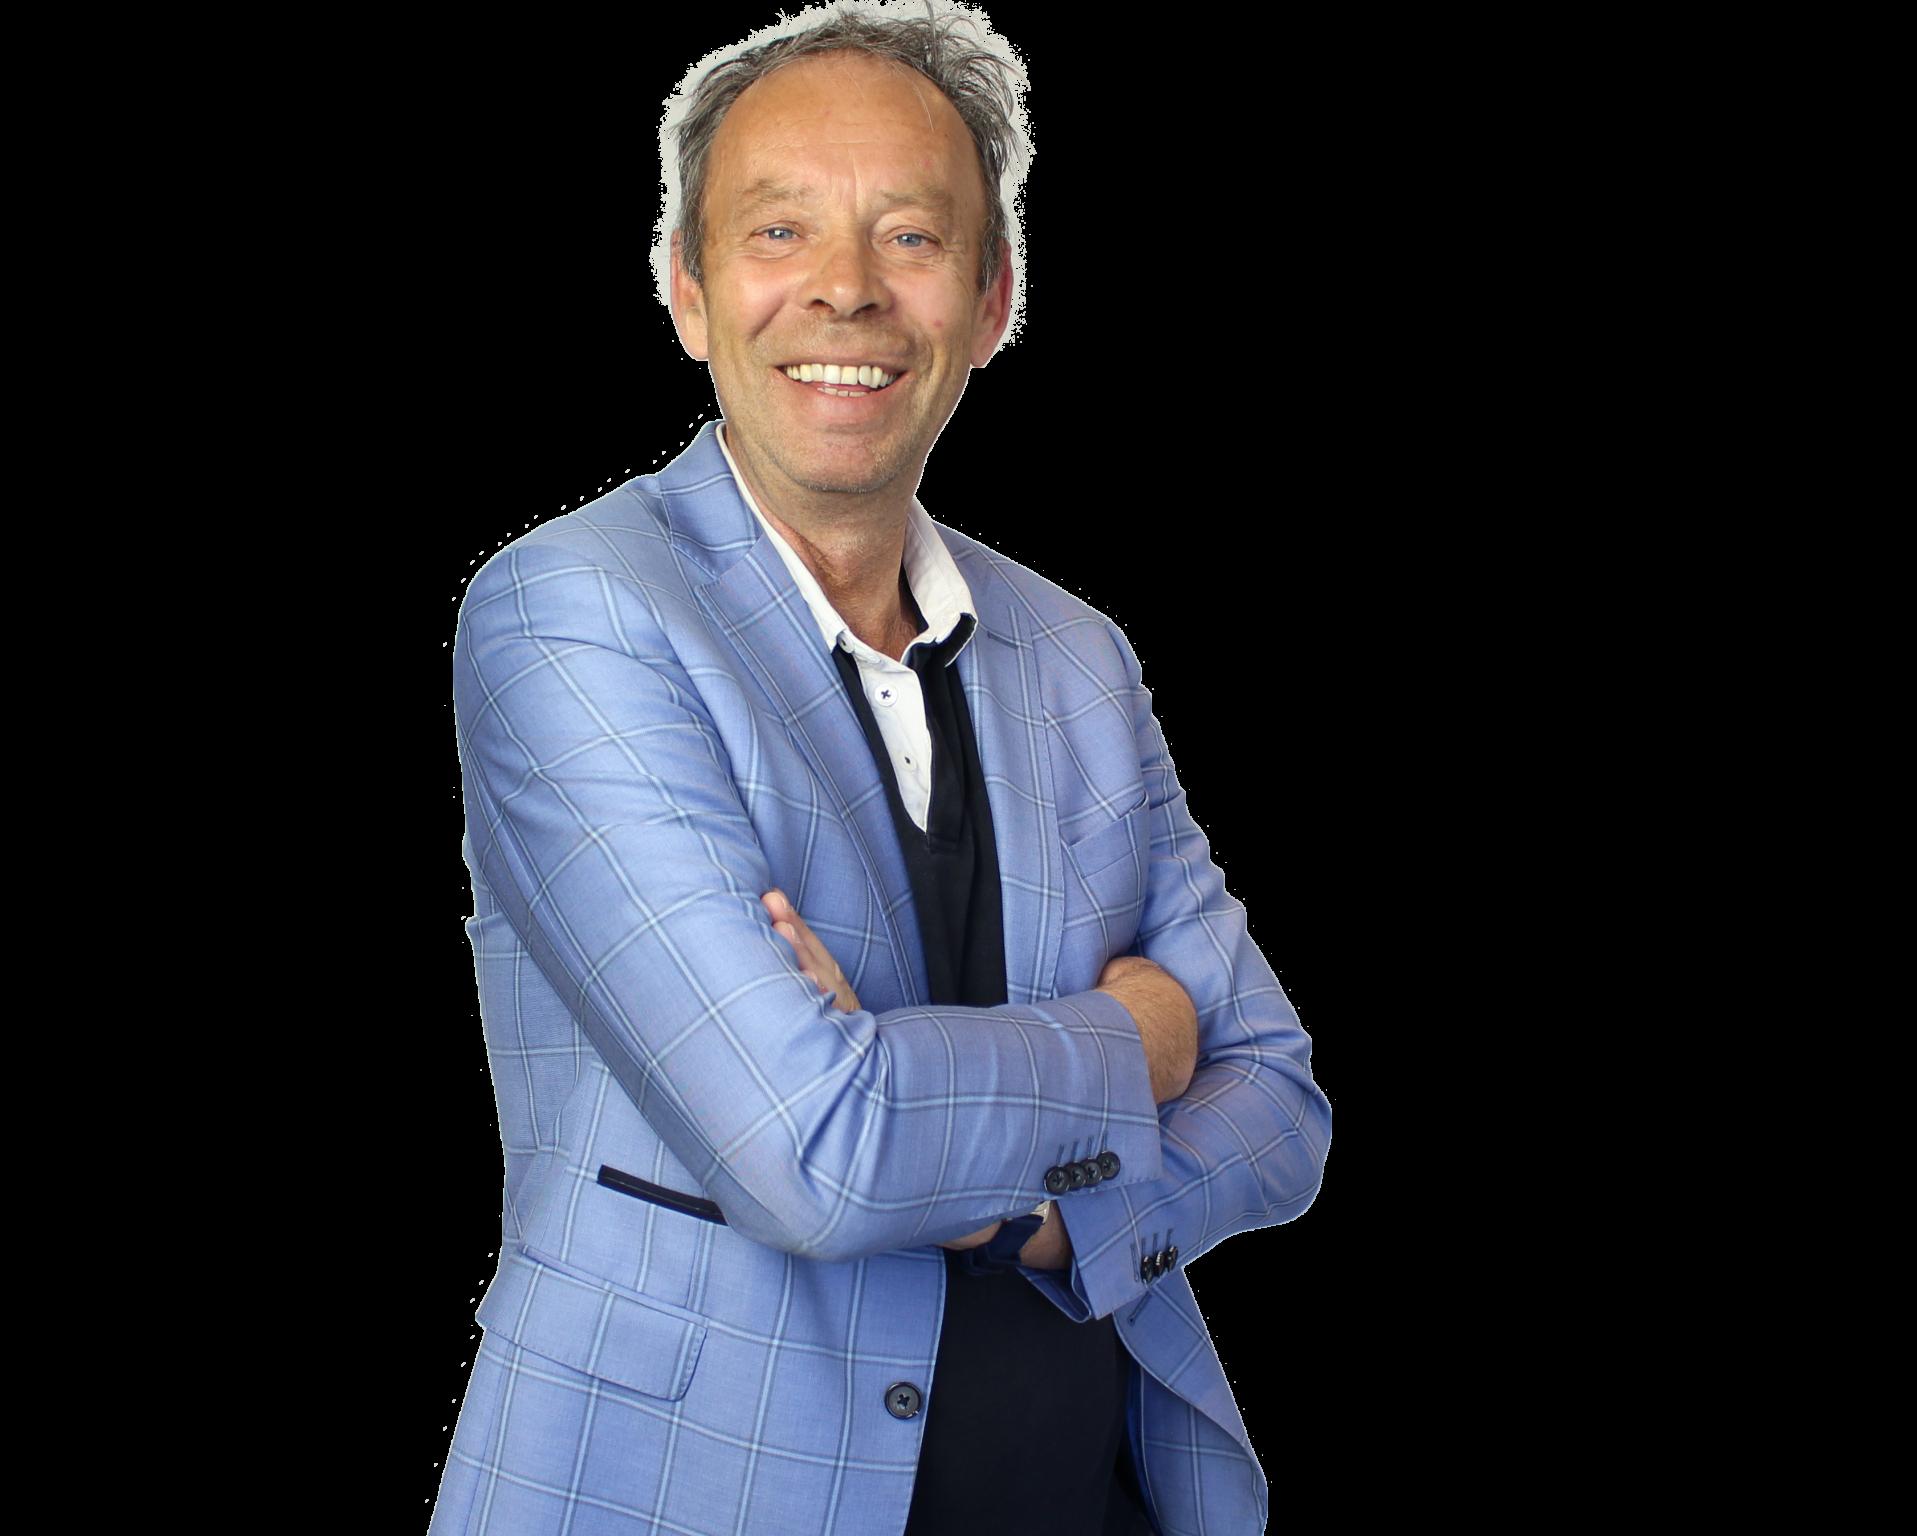 Erik Jan